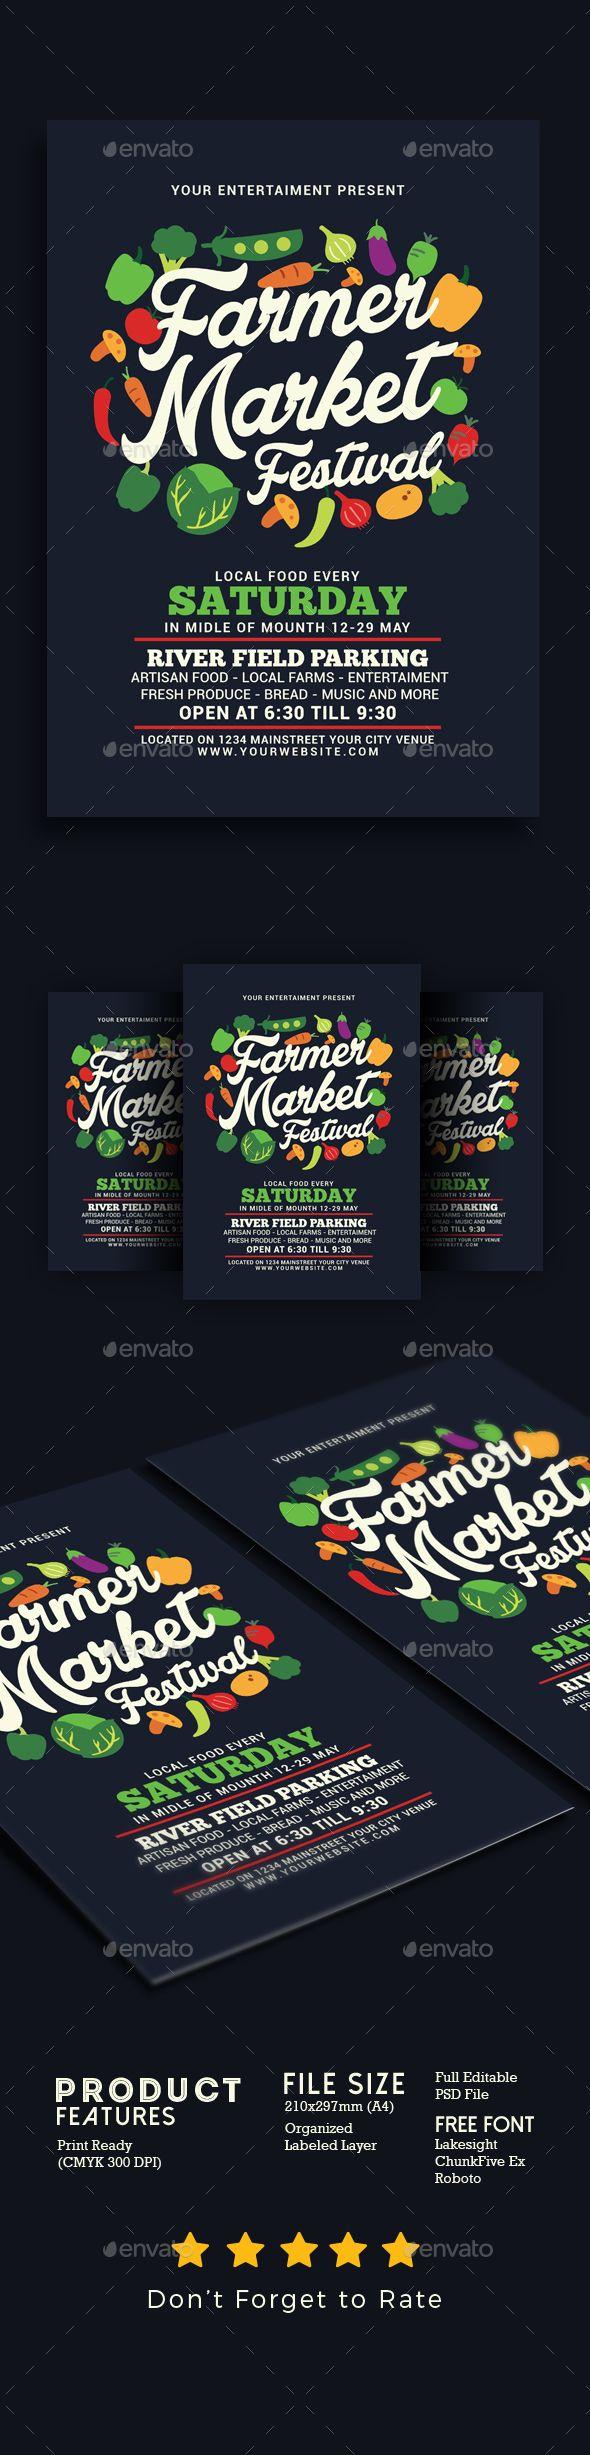 Farmer Market Festival Flyer Template PSD